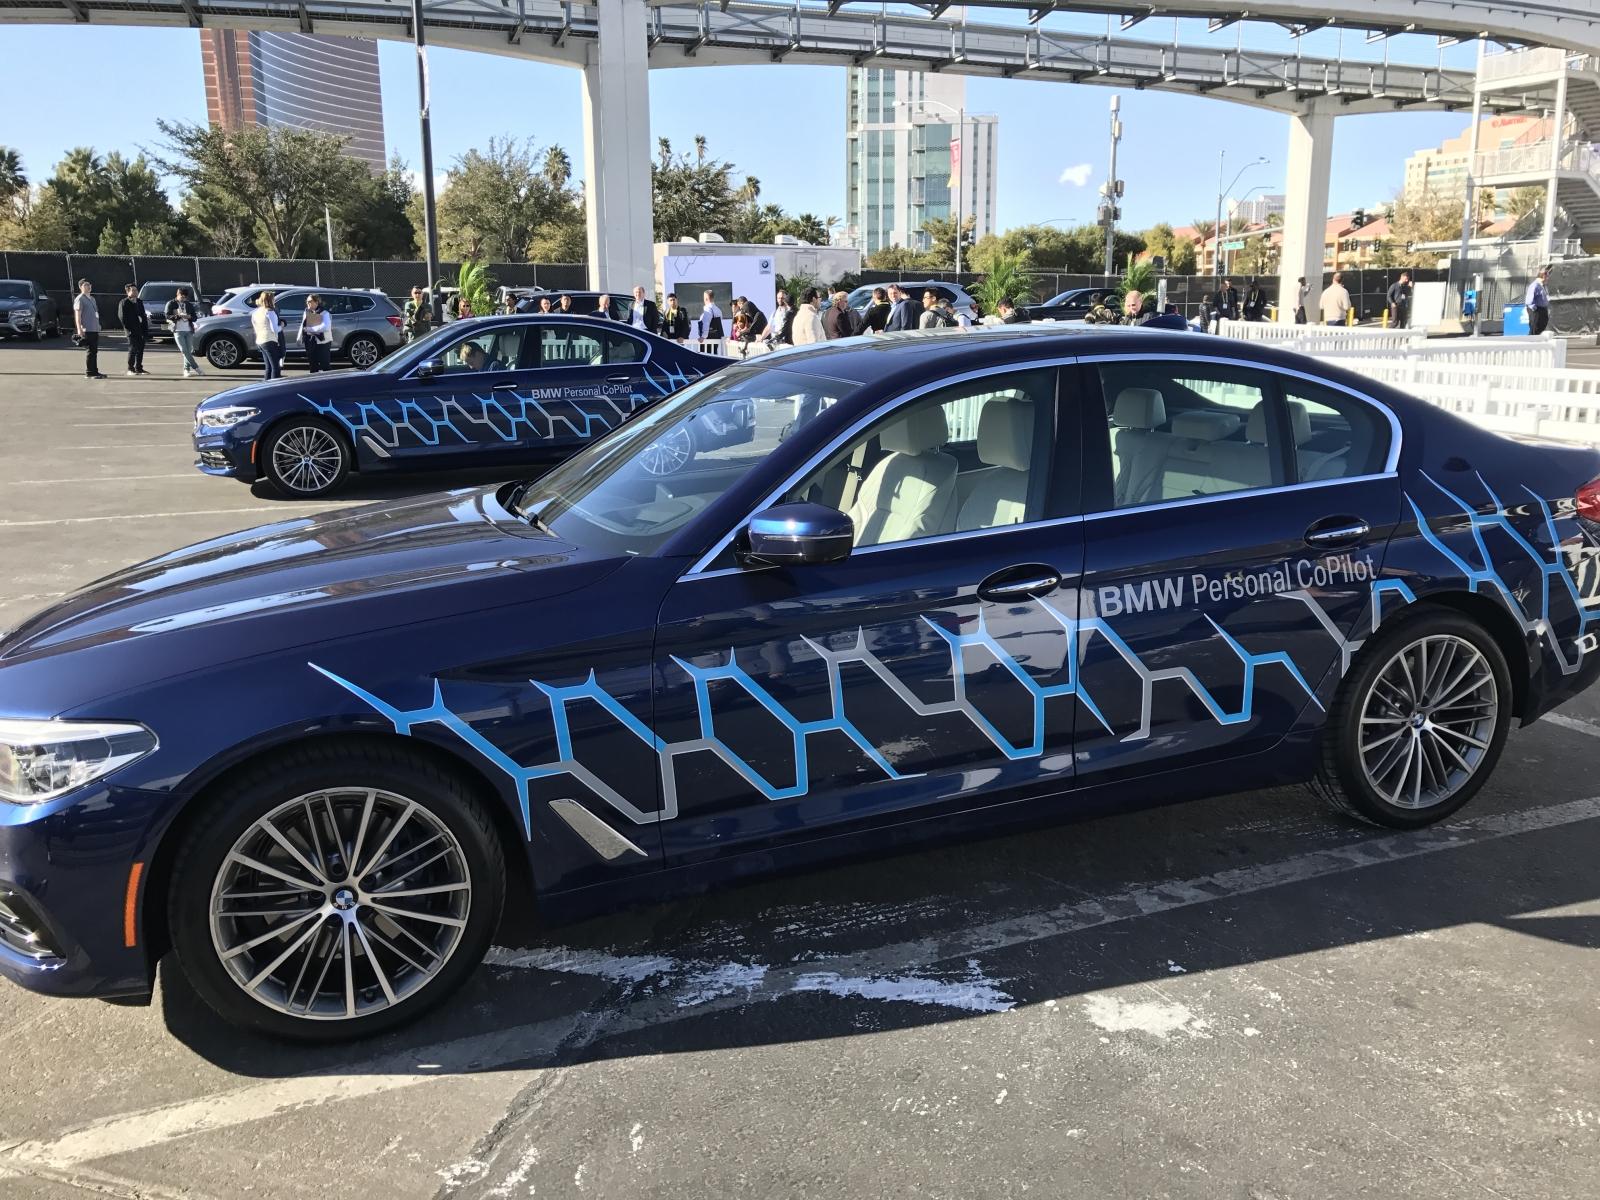 BMW self-driving car